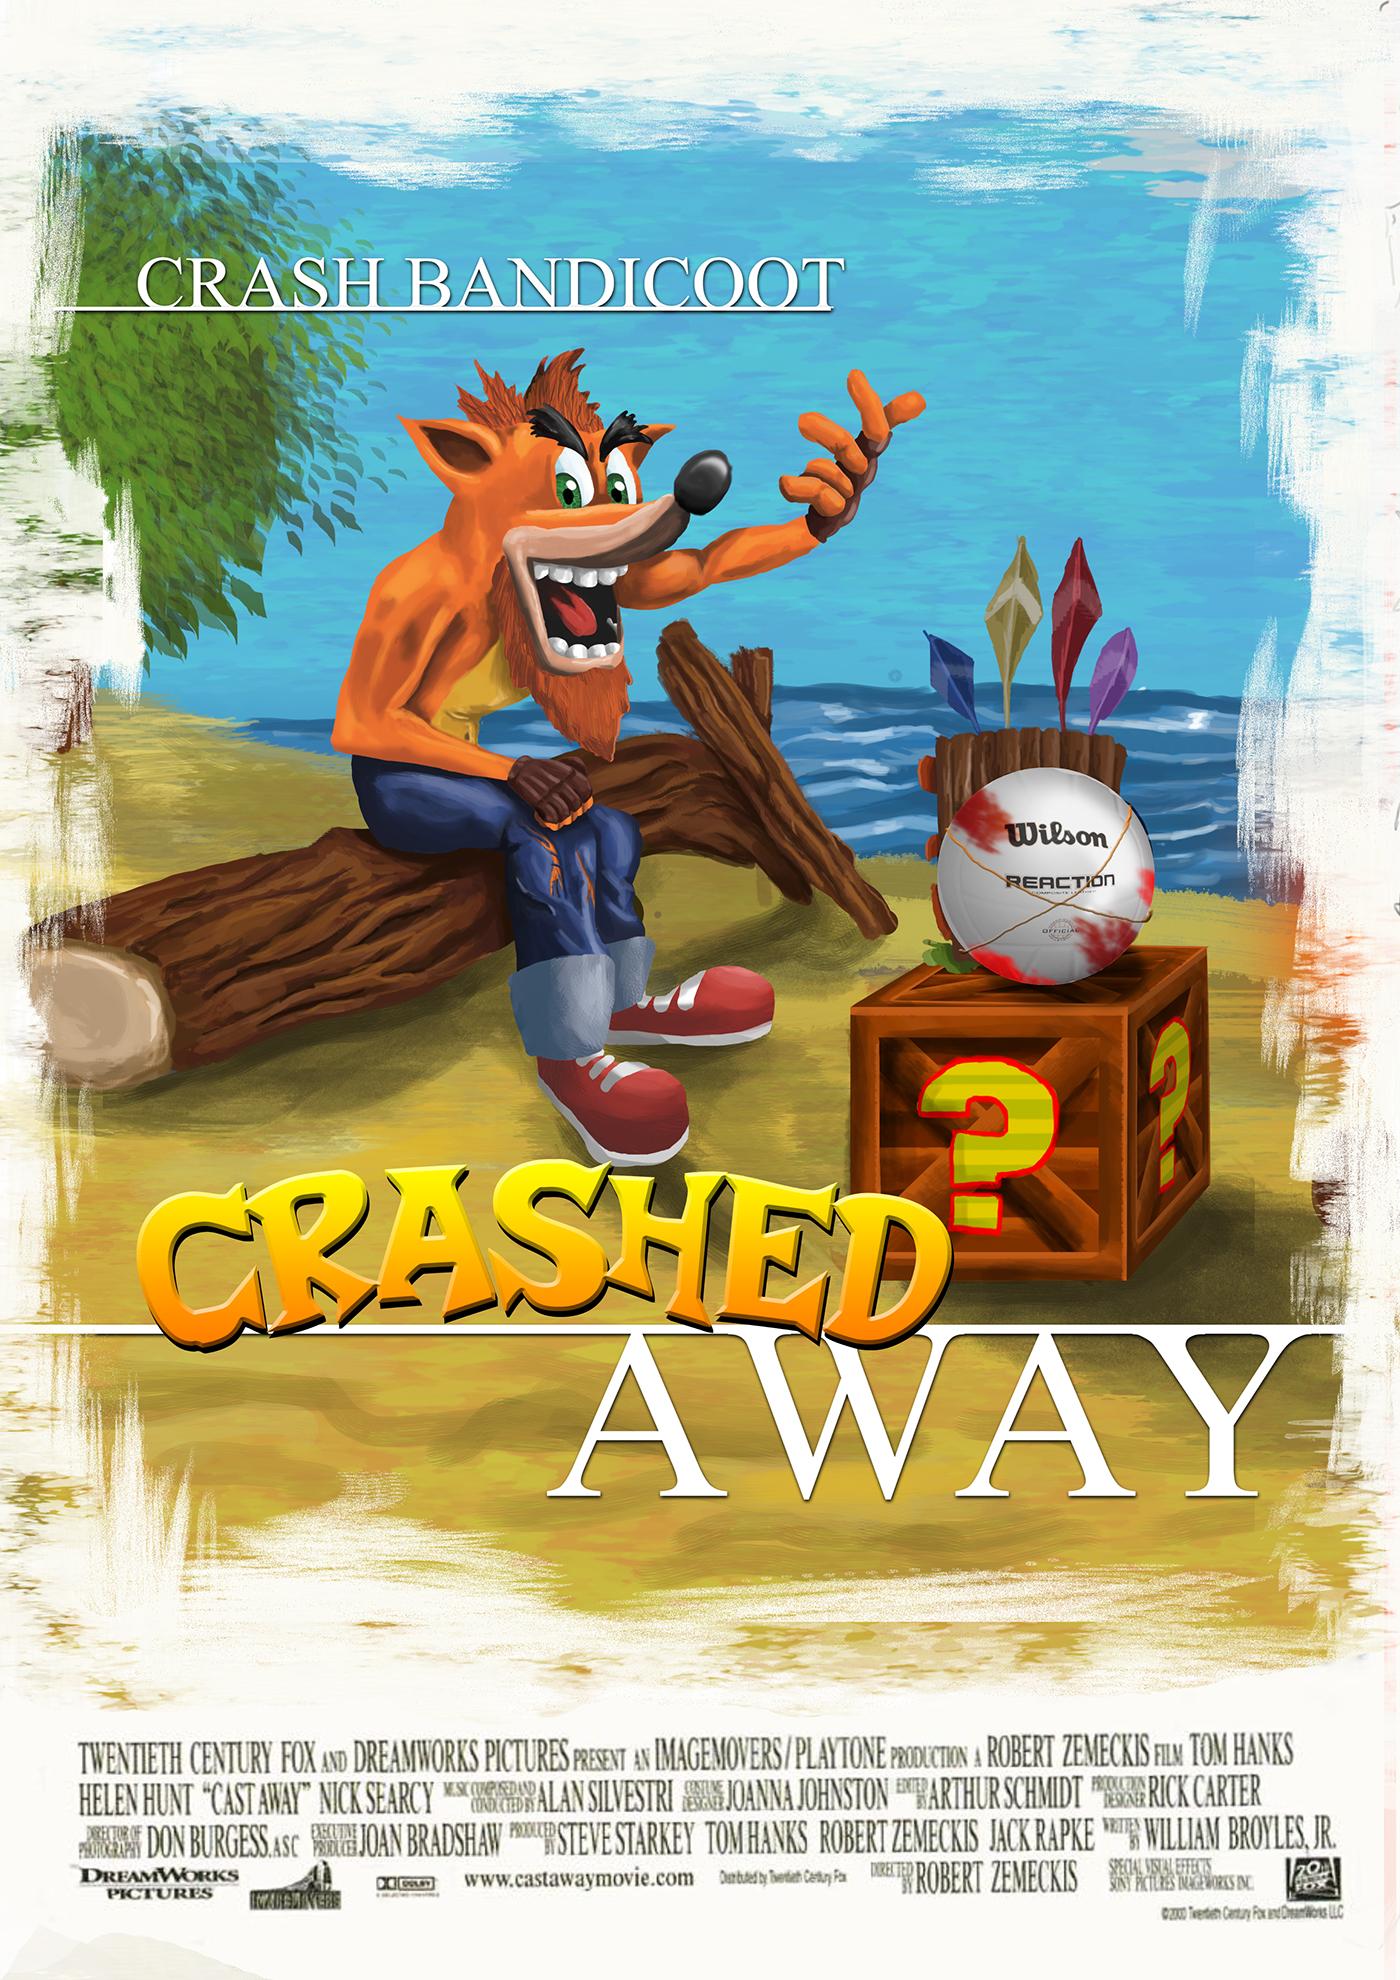 Crash Badicoot x Cast away Mad max x mario the legend of zelda majora's max x v for vendetta poster mashup